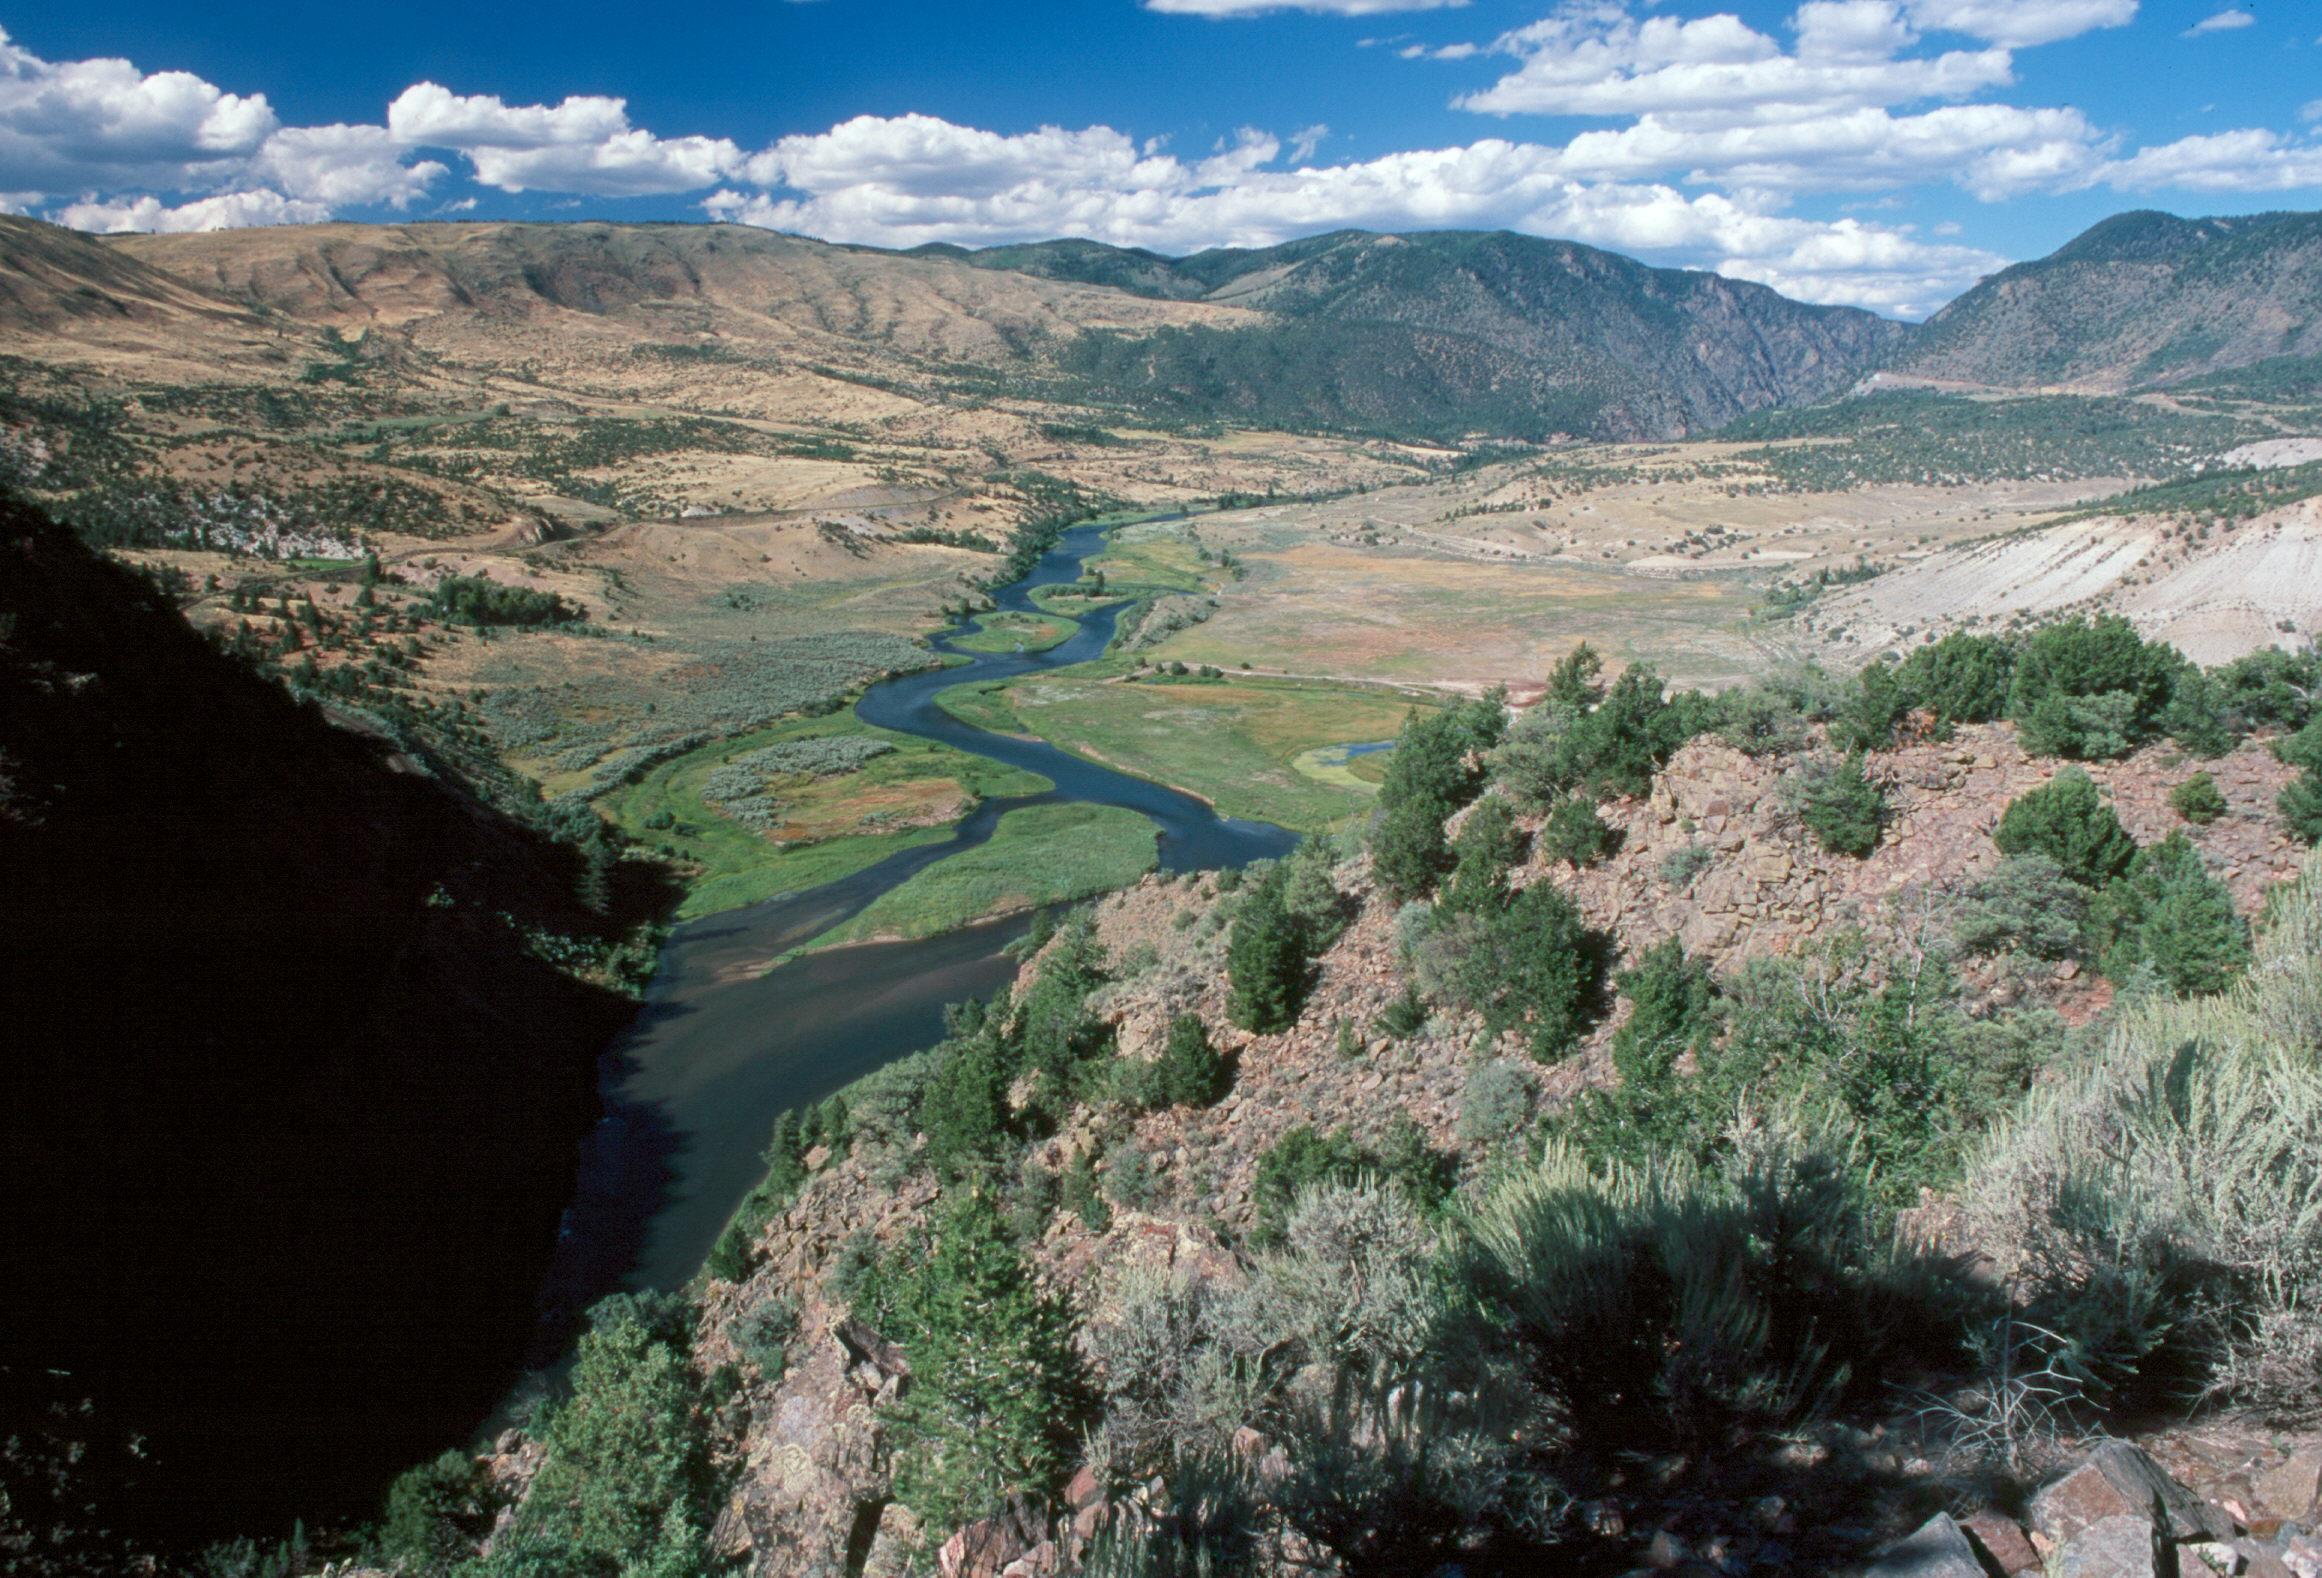 The Colorado River near Pumphouse